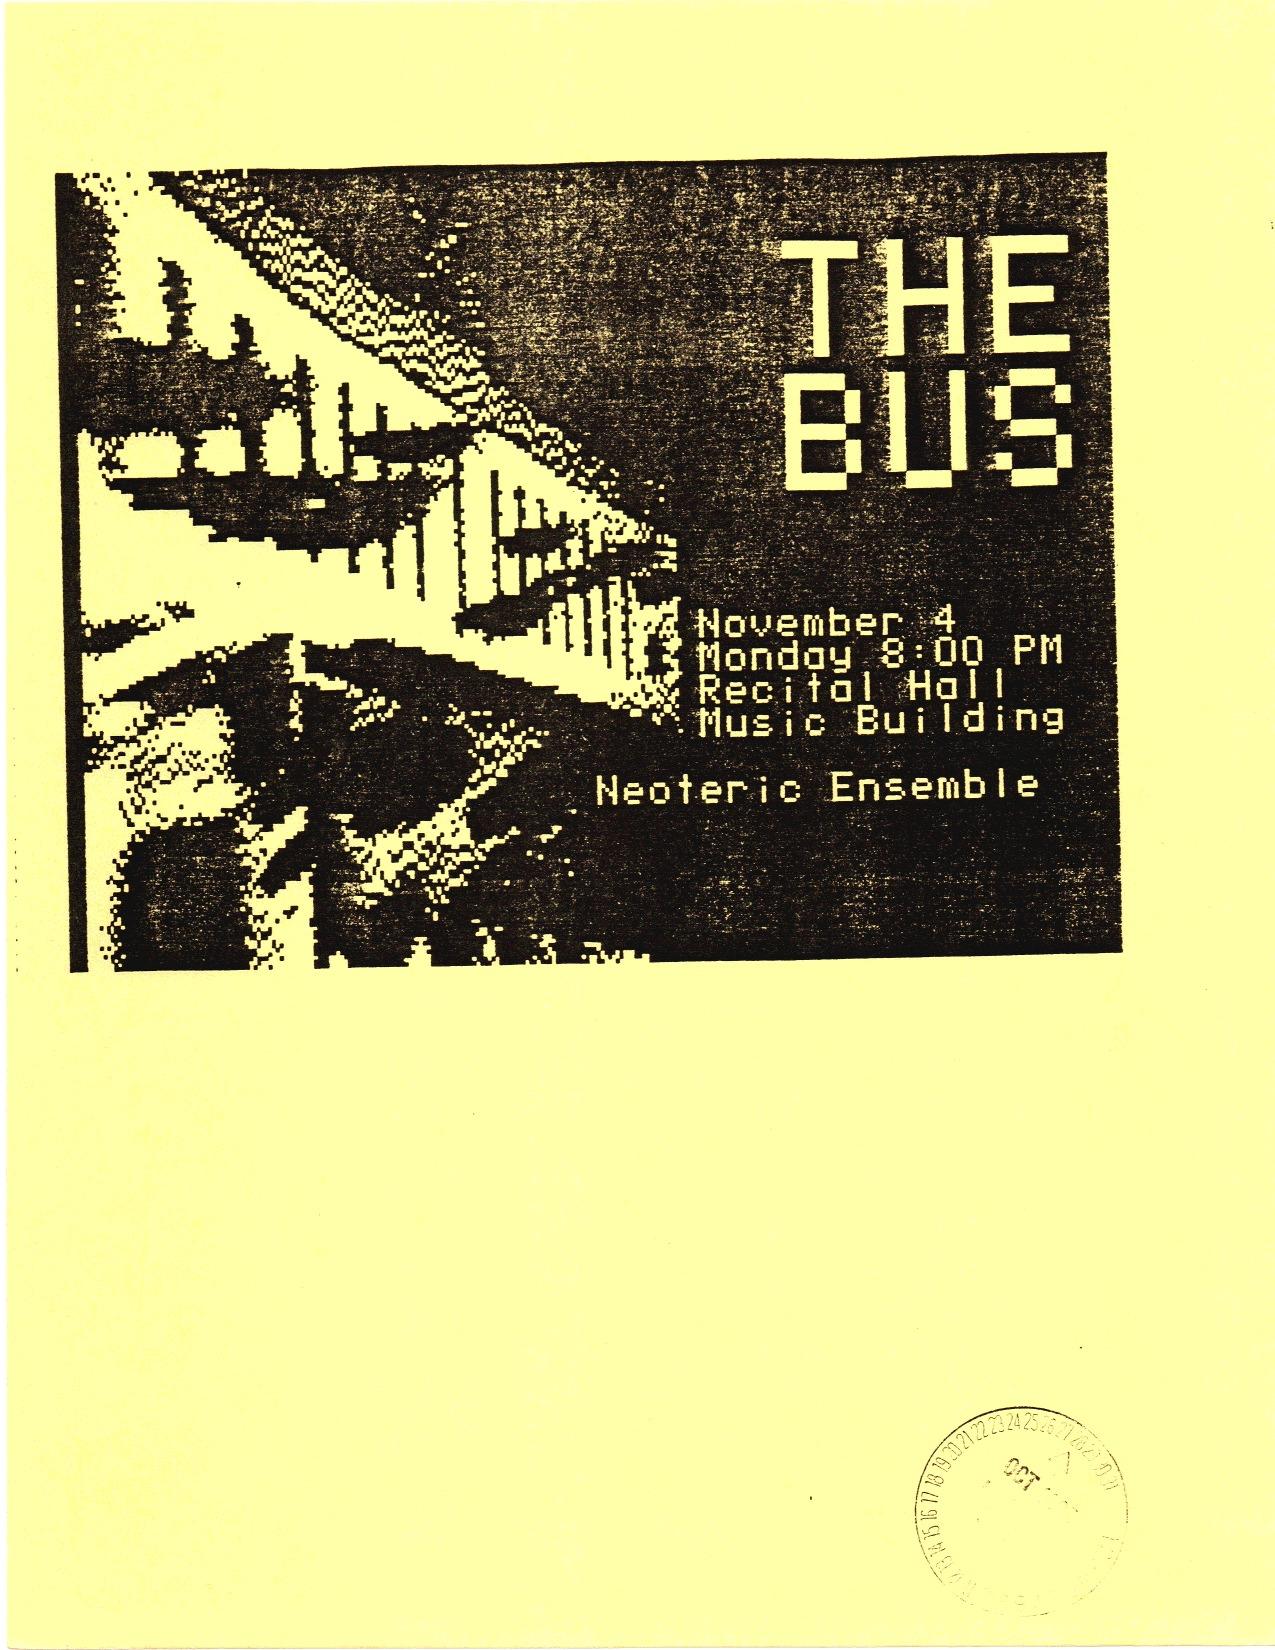 ArtBus poster 02, 1985